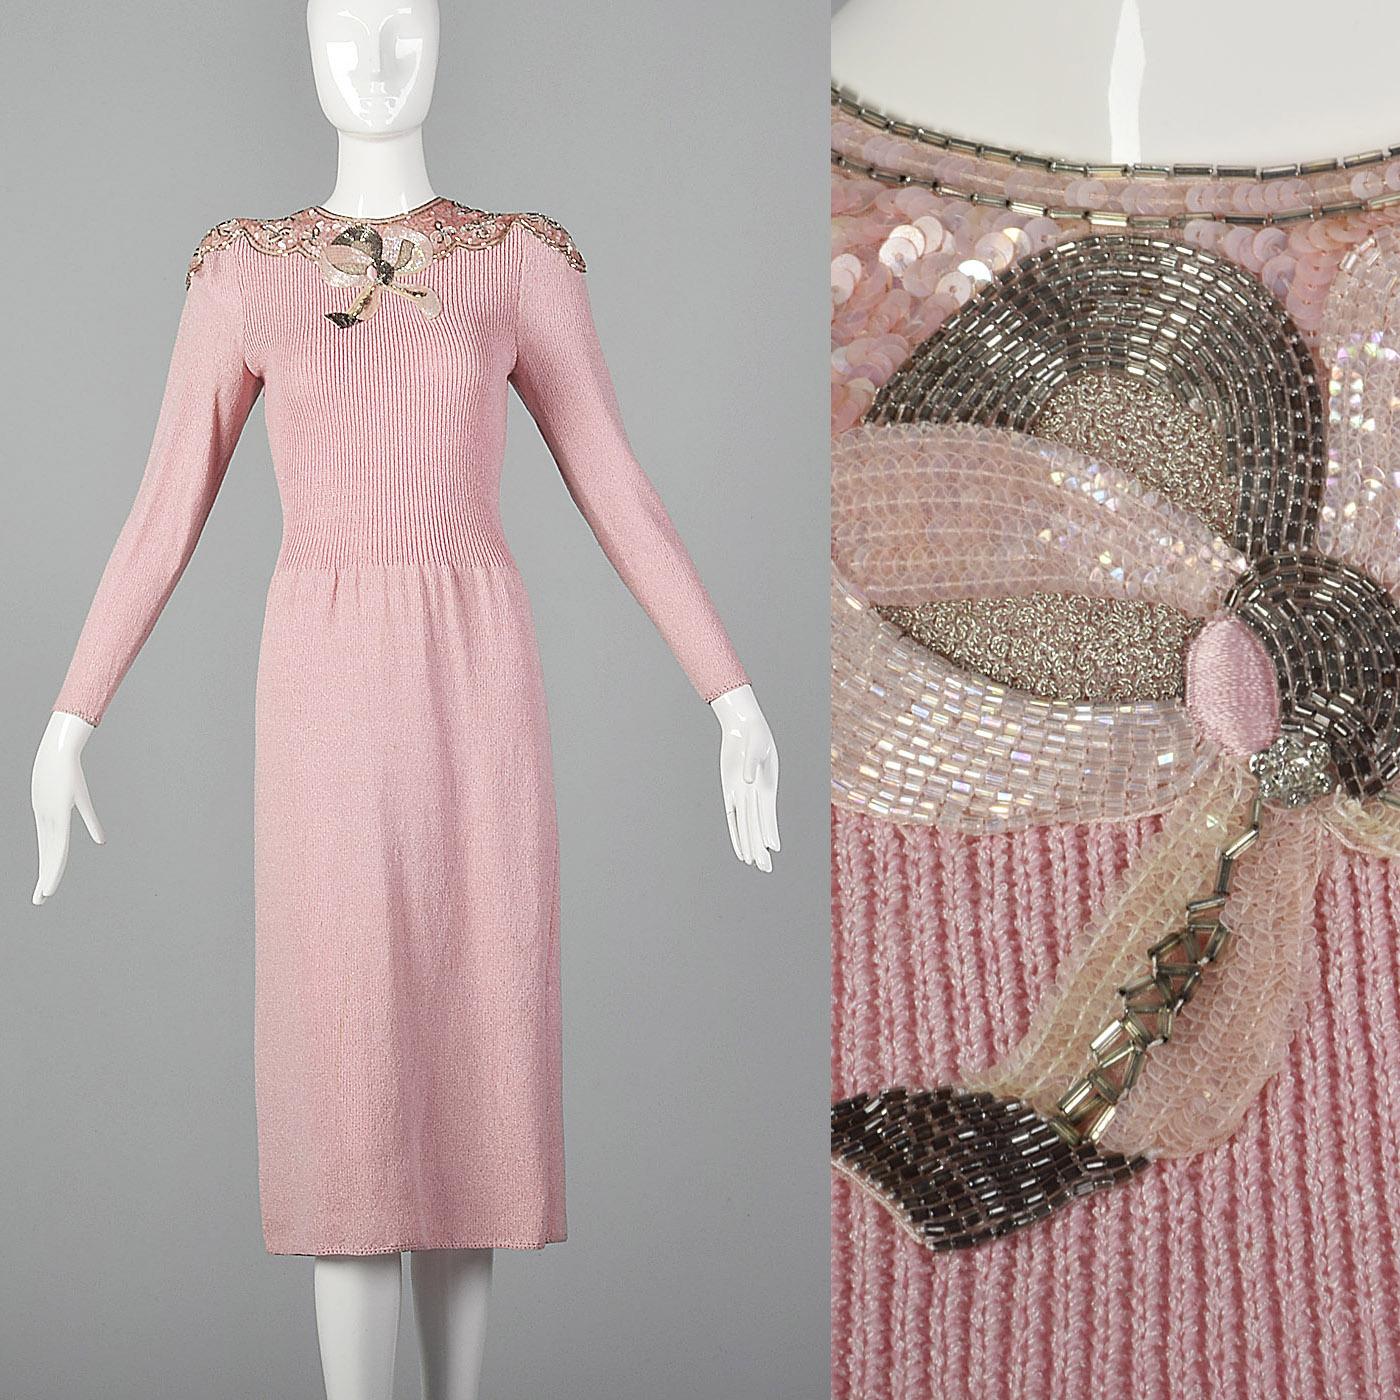 e99c4e7c Details about Medium Pat Sandler 1980s Knit Dress Sweater Dress VTG 80s  Beaded Sequin Pink